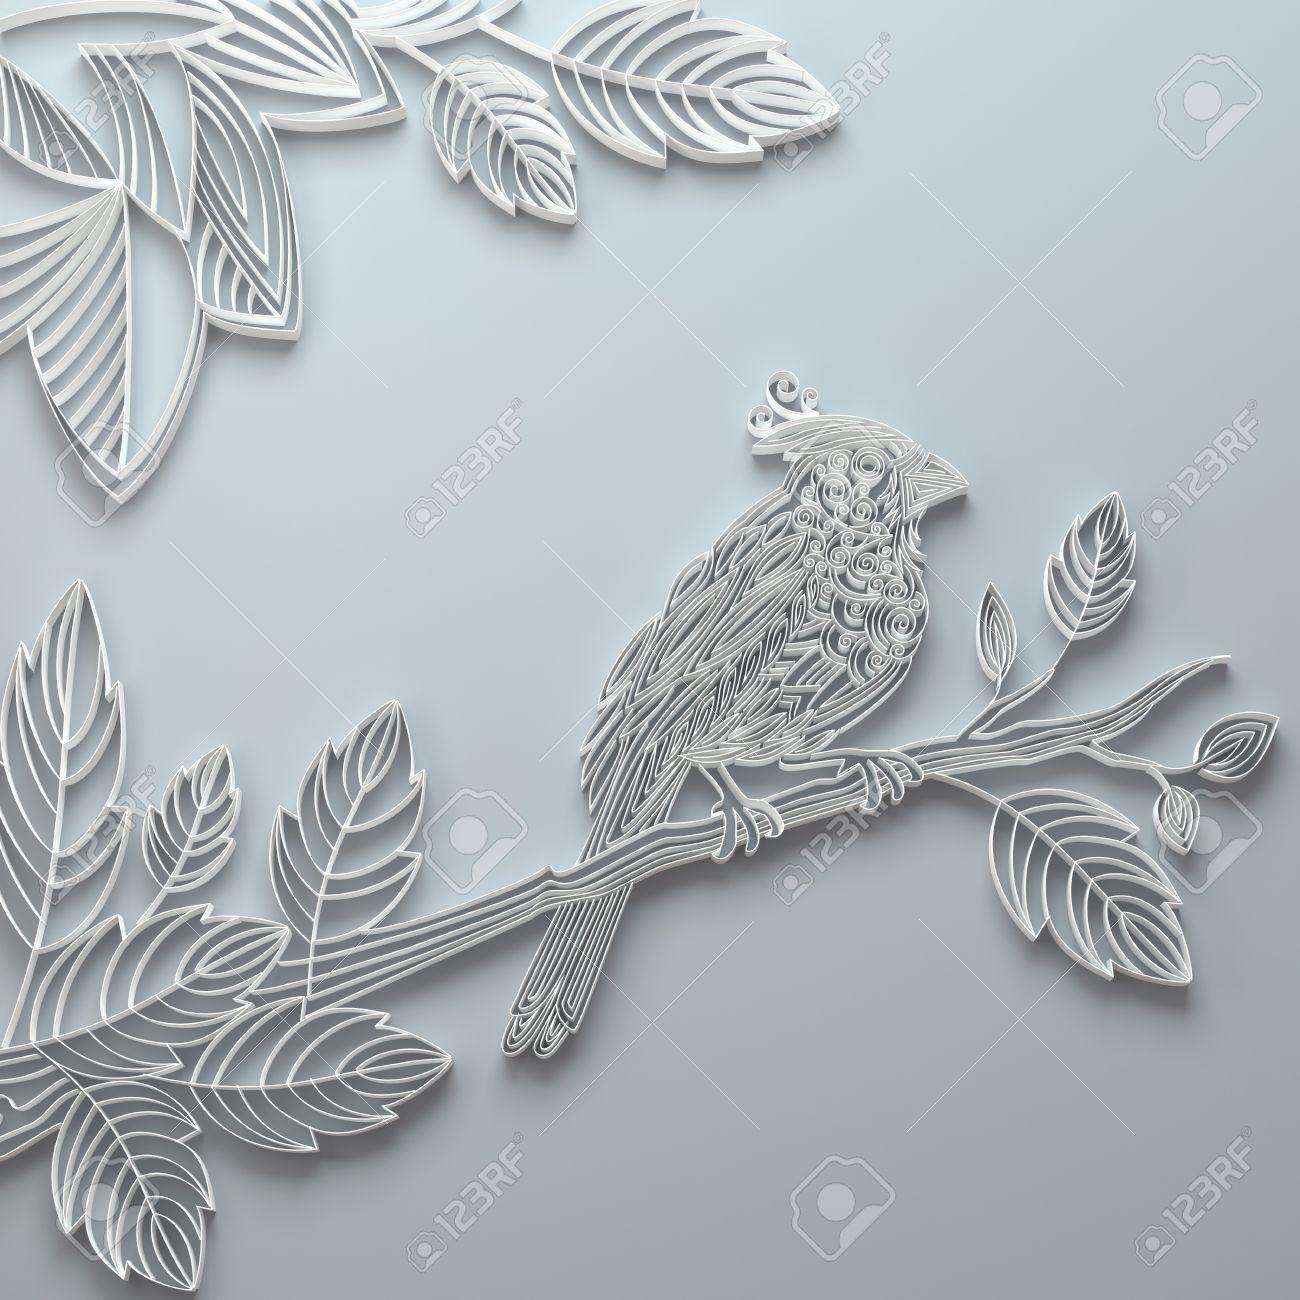 White Decorative Ornate Paper Quilling Bird Background Stock Photo ...